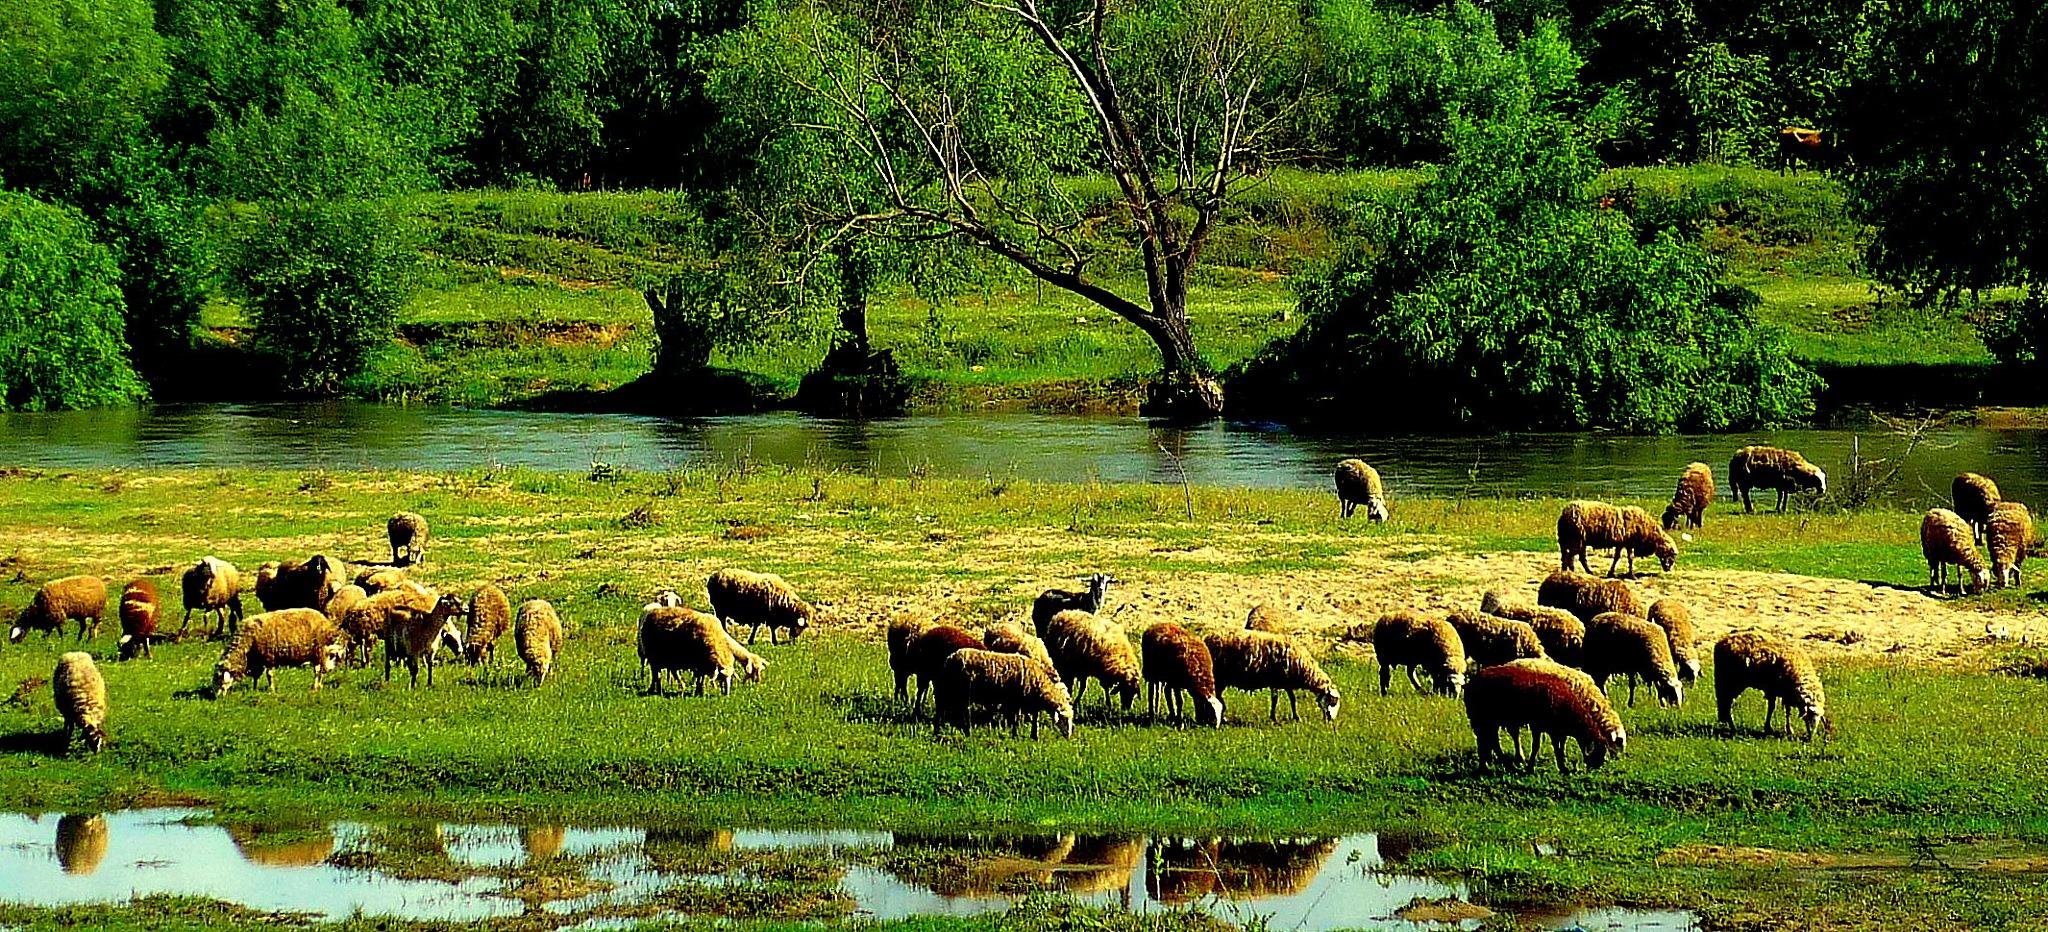 Maritsa river, near Plovdiv city, Bulgaria by StefanTodorov